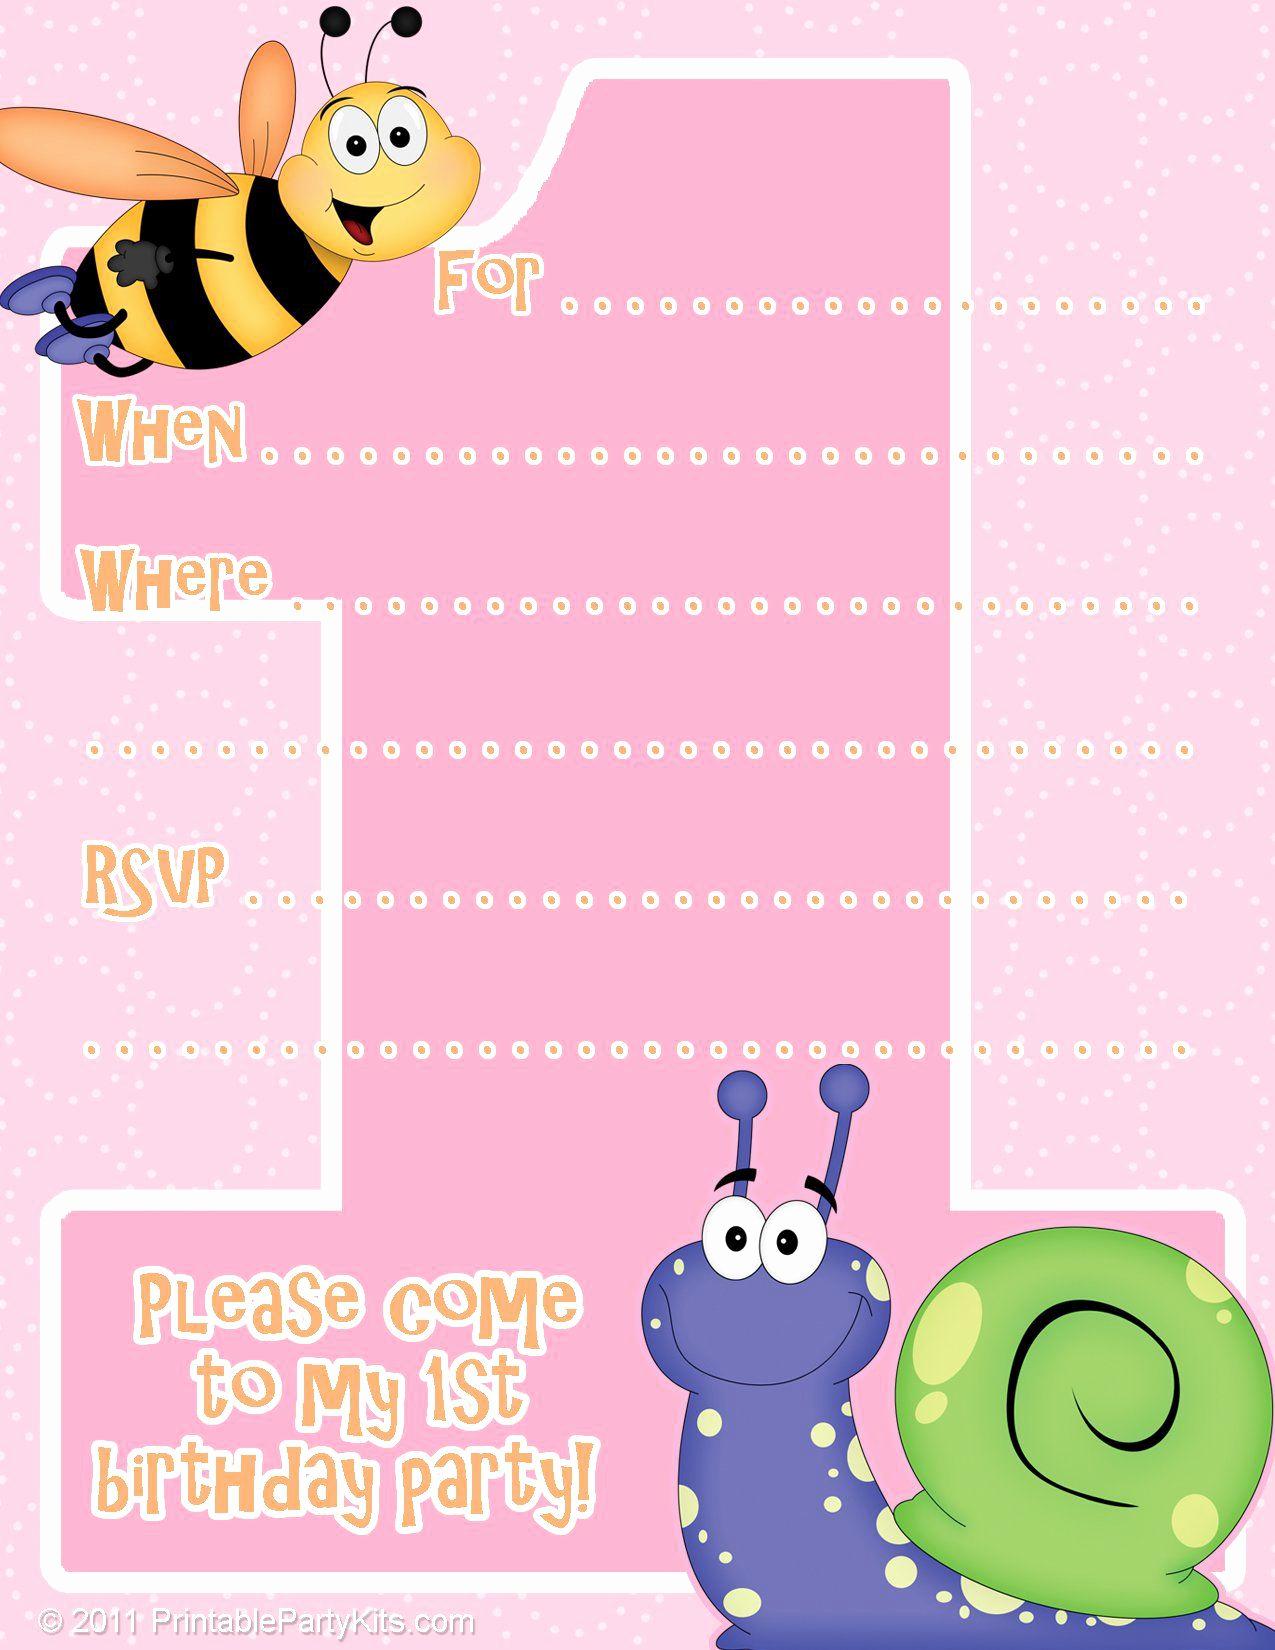 Birthday Invitation Templates Word Luxury Birthday Invitation Card Template Word